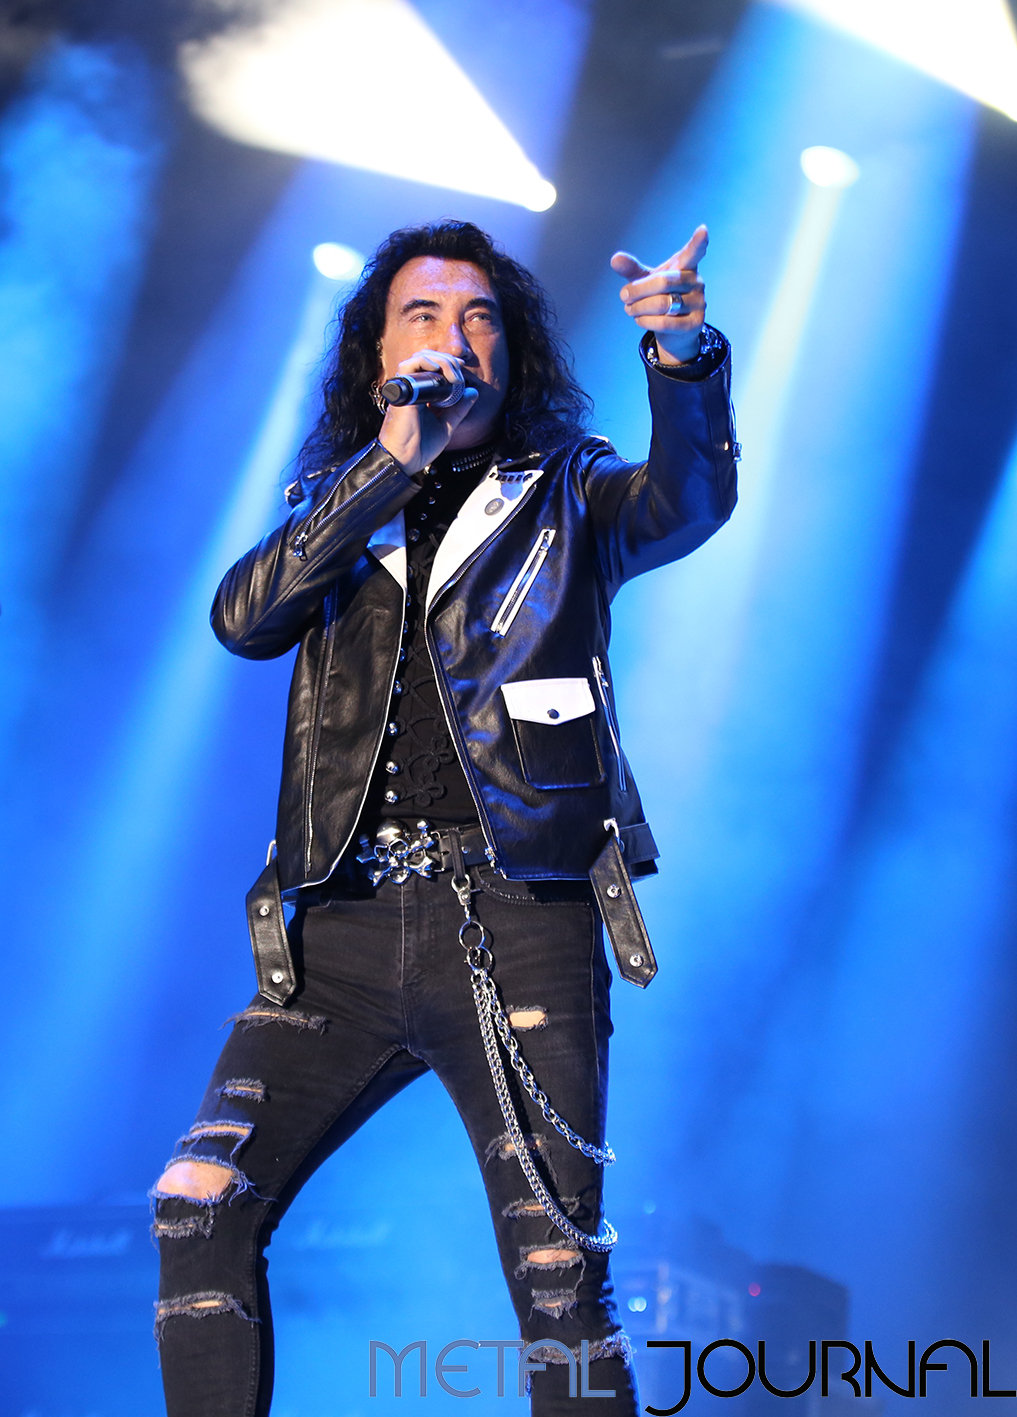 michael schenker fest - metal journal rock fest barcelona 2019 pic 13